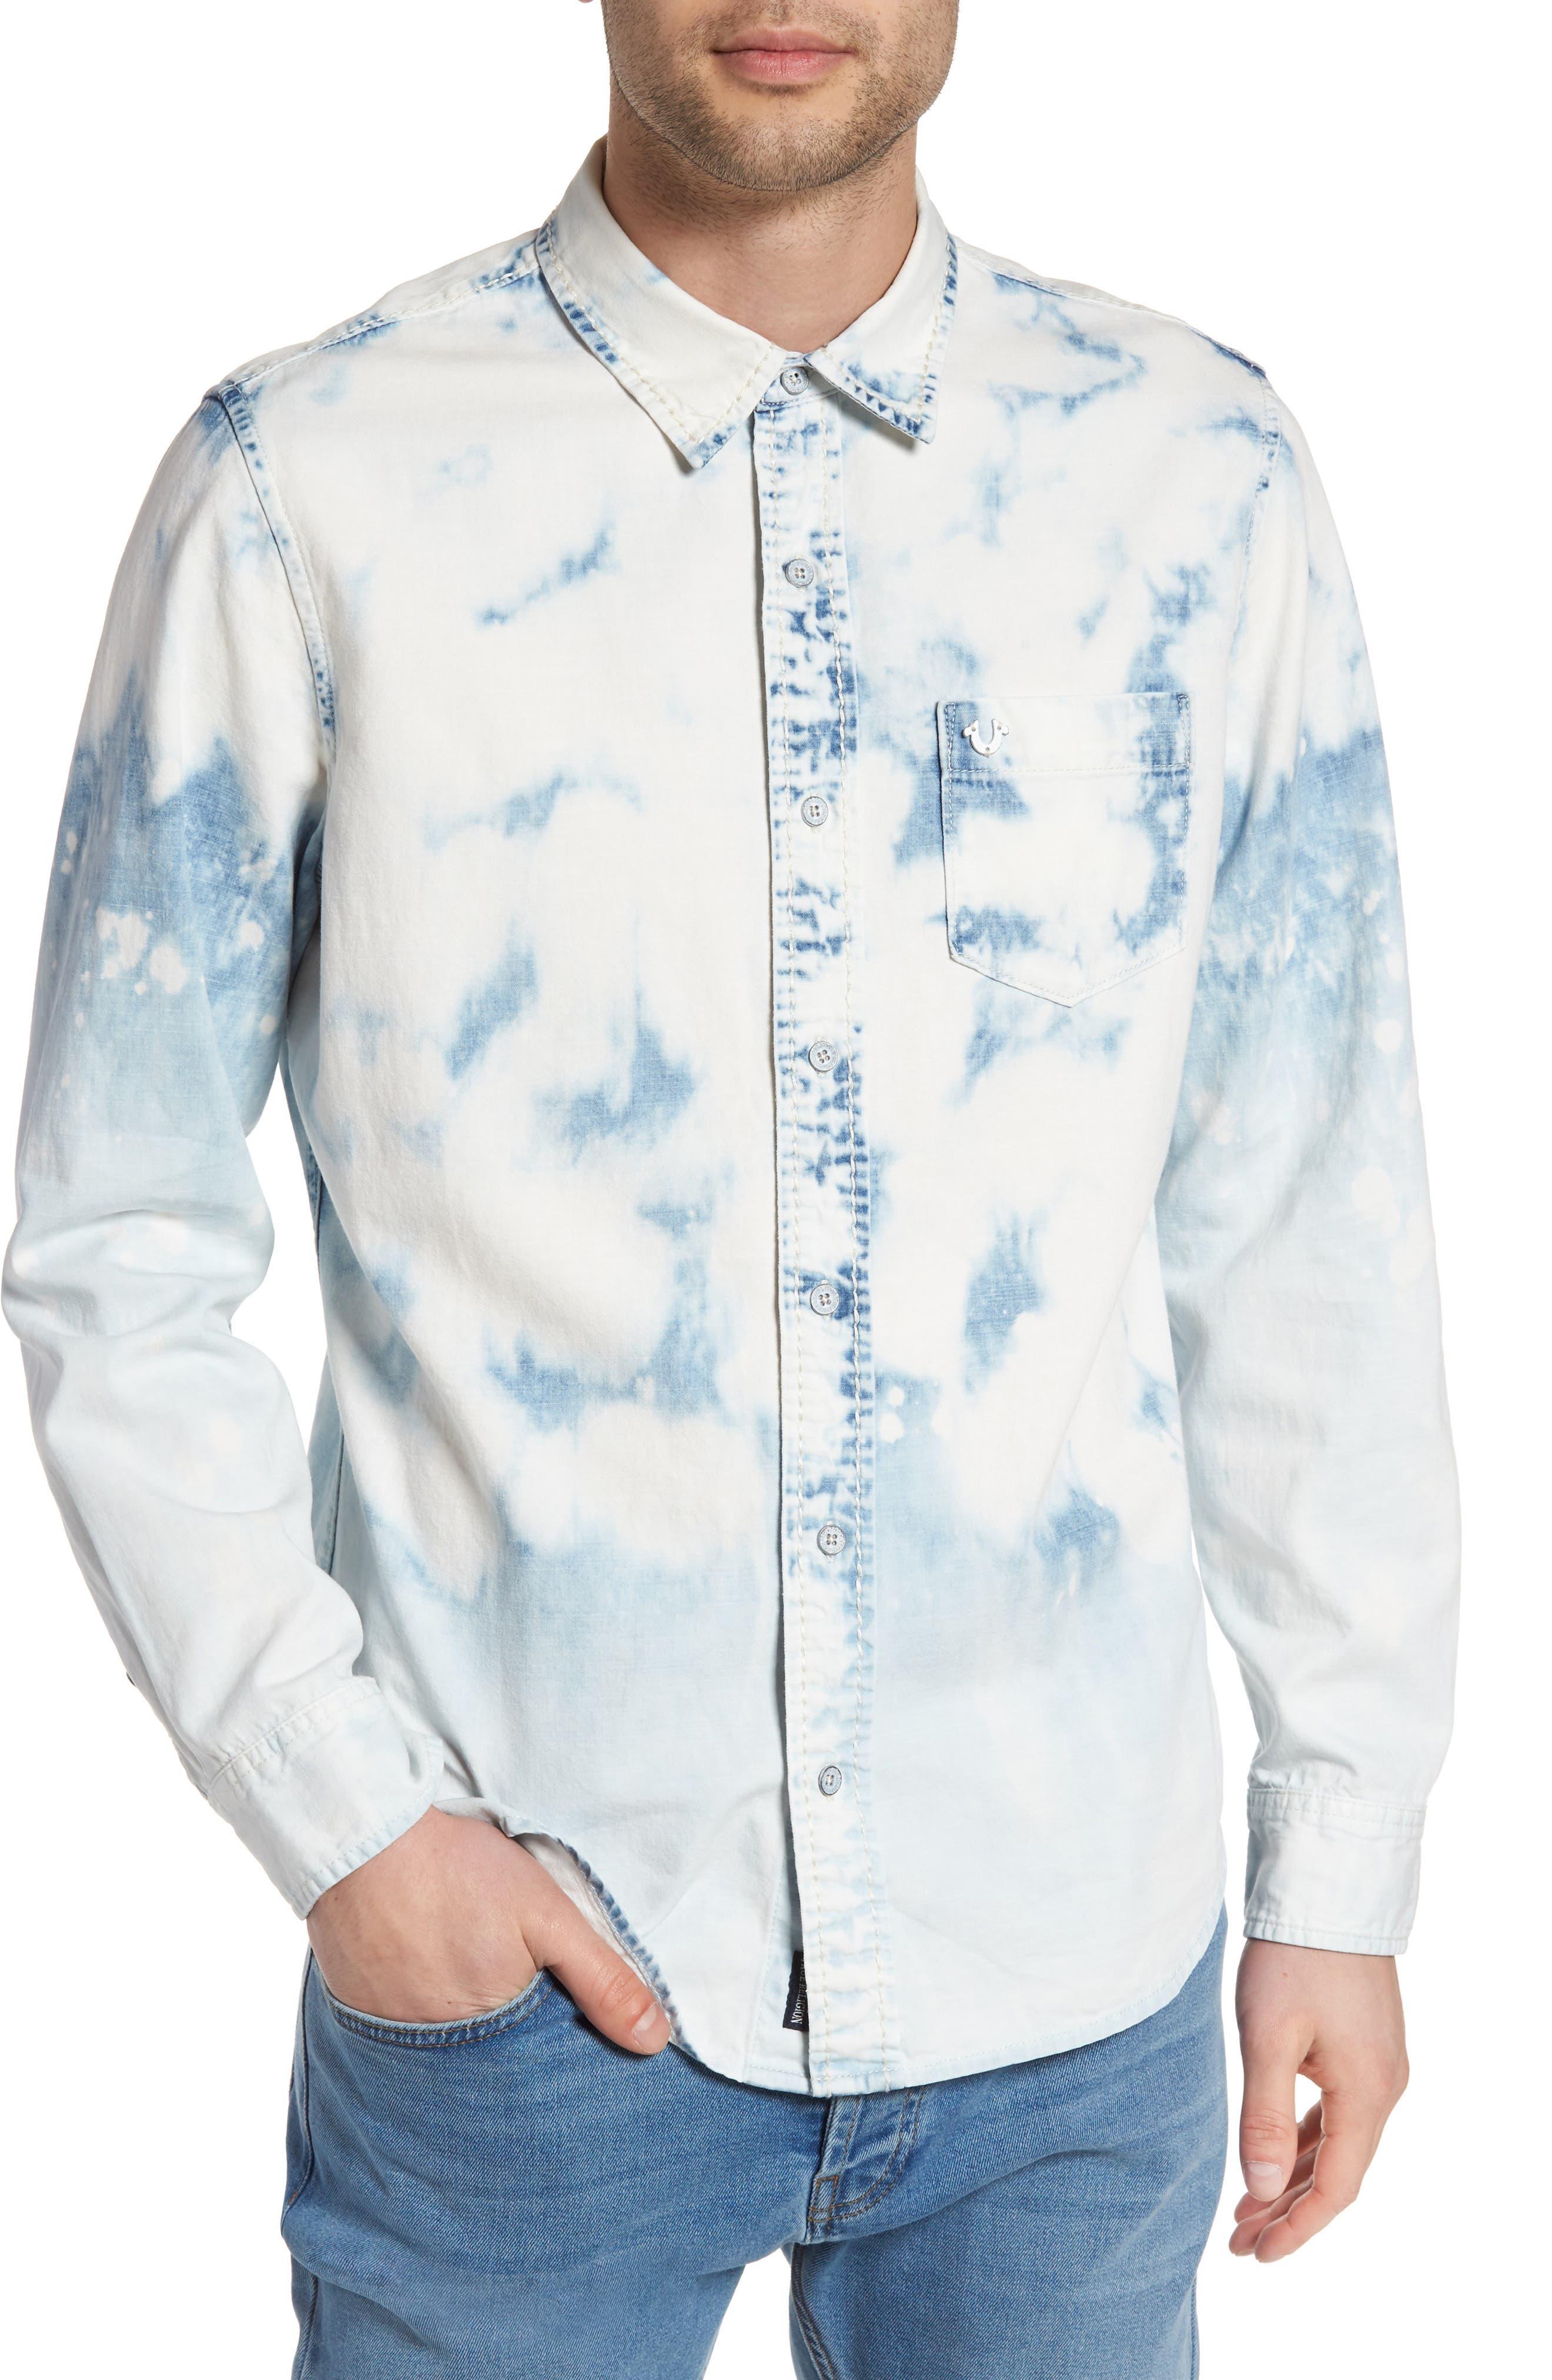 Bleached Denim Shirt,                             Main thumbnail 1, color,                             400